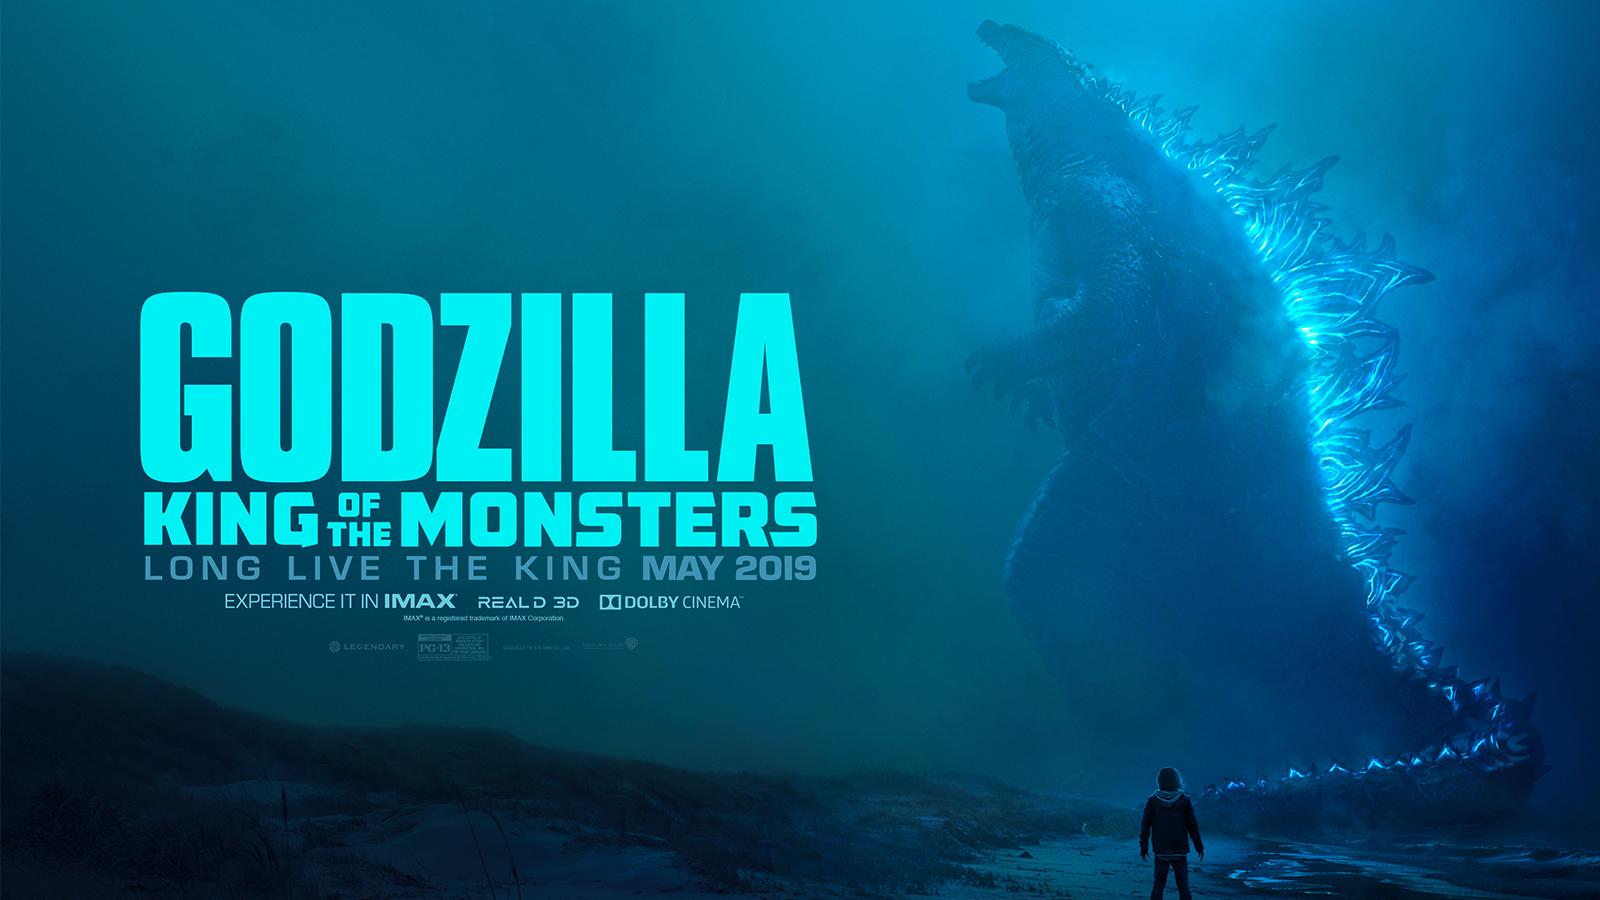 Review Film Godzilla King Of The Monsters 2019 Epik Dan Serunya Godzilla Melawan Berbagai Monster Ganas Movieden